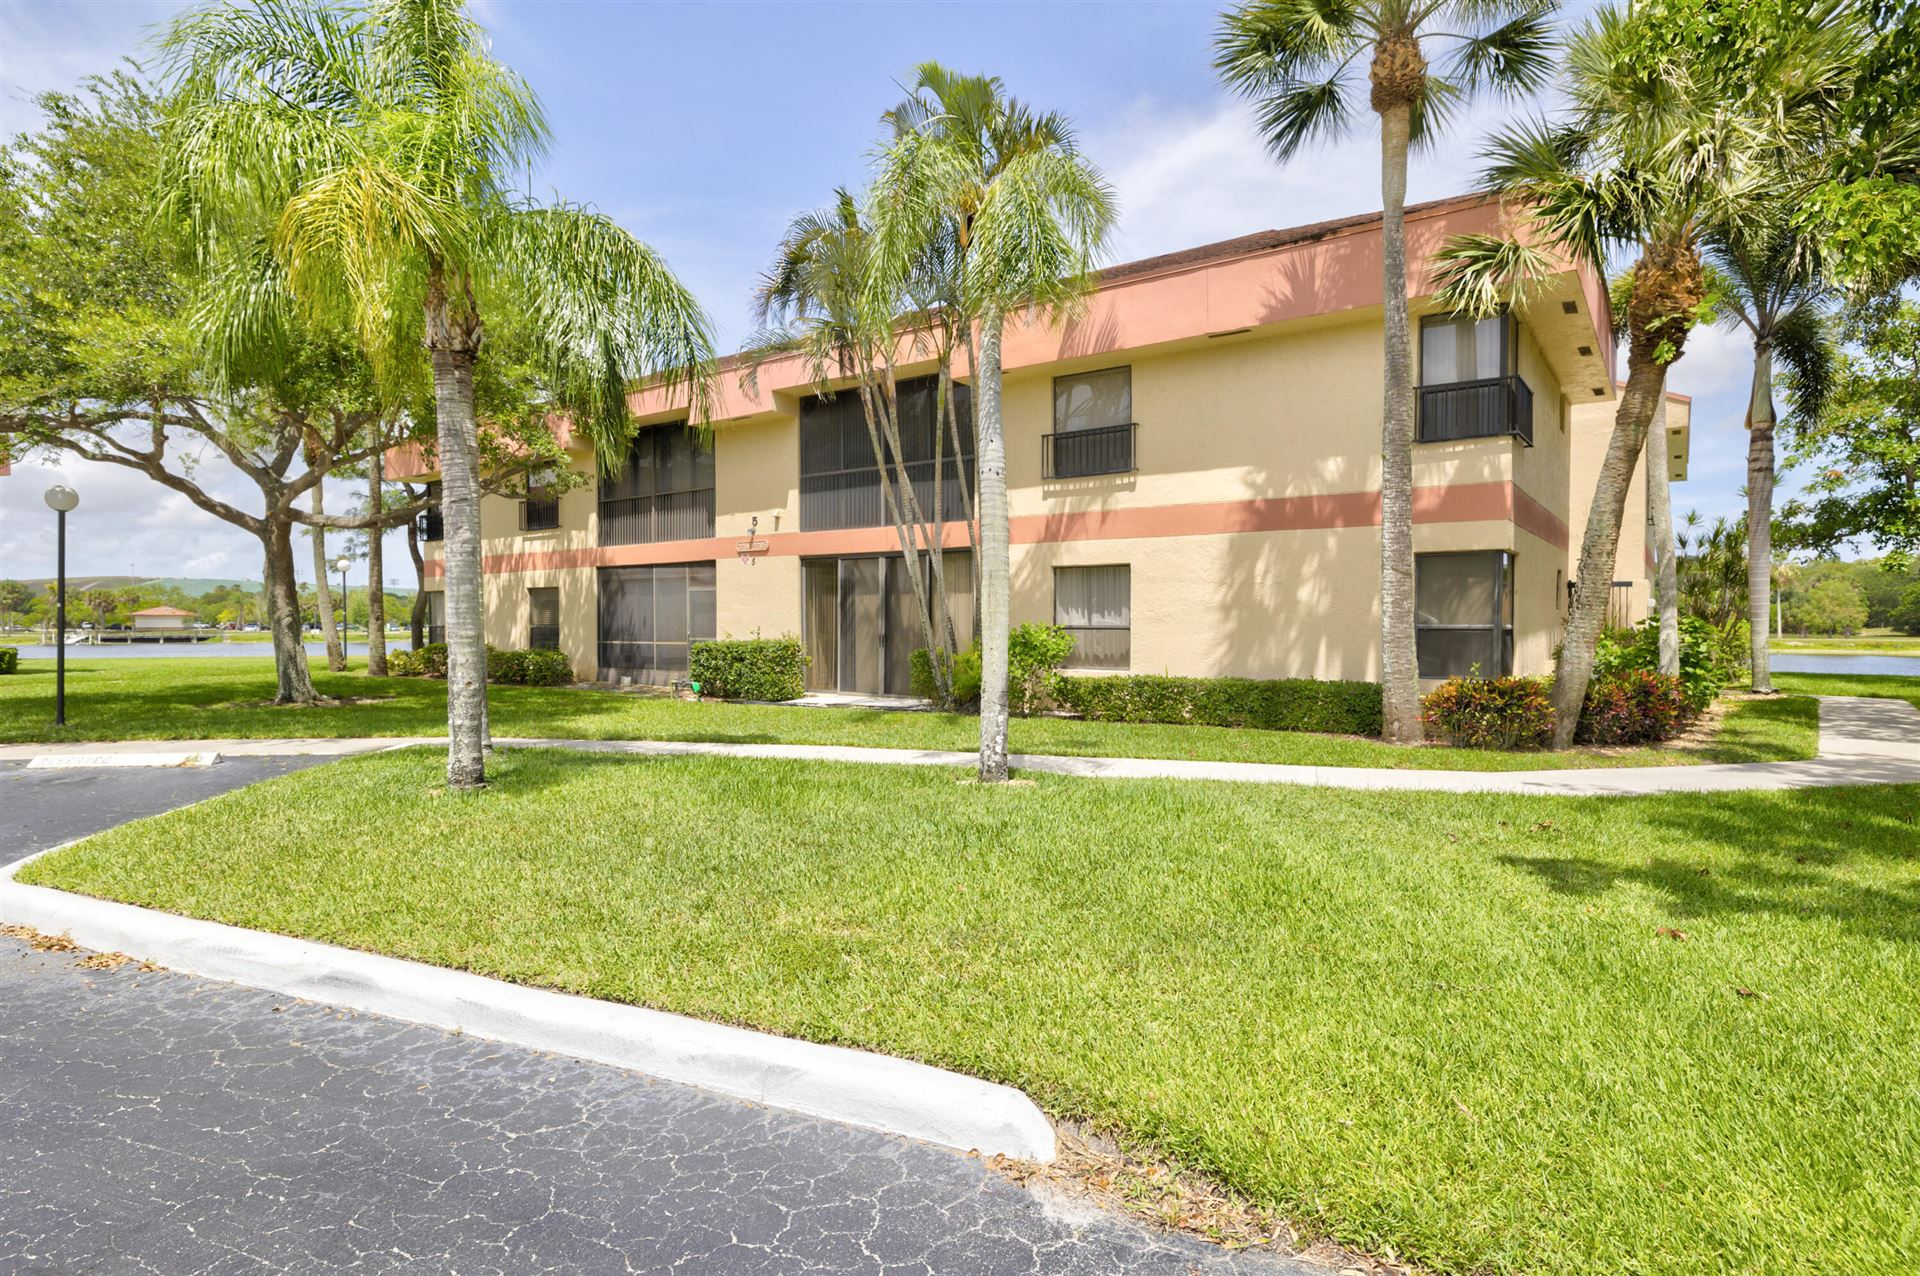 2759 Carambola Circle S #1934, Coconut Creek, FL 33066 - MLS#: RX-10717322